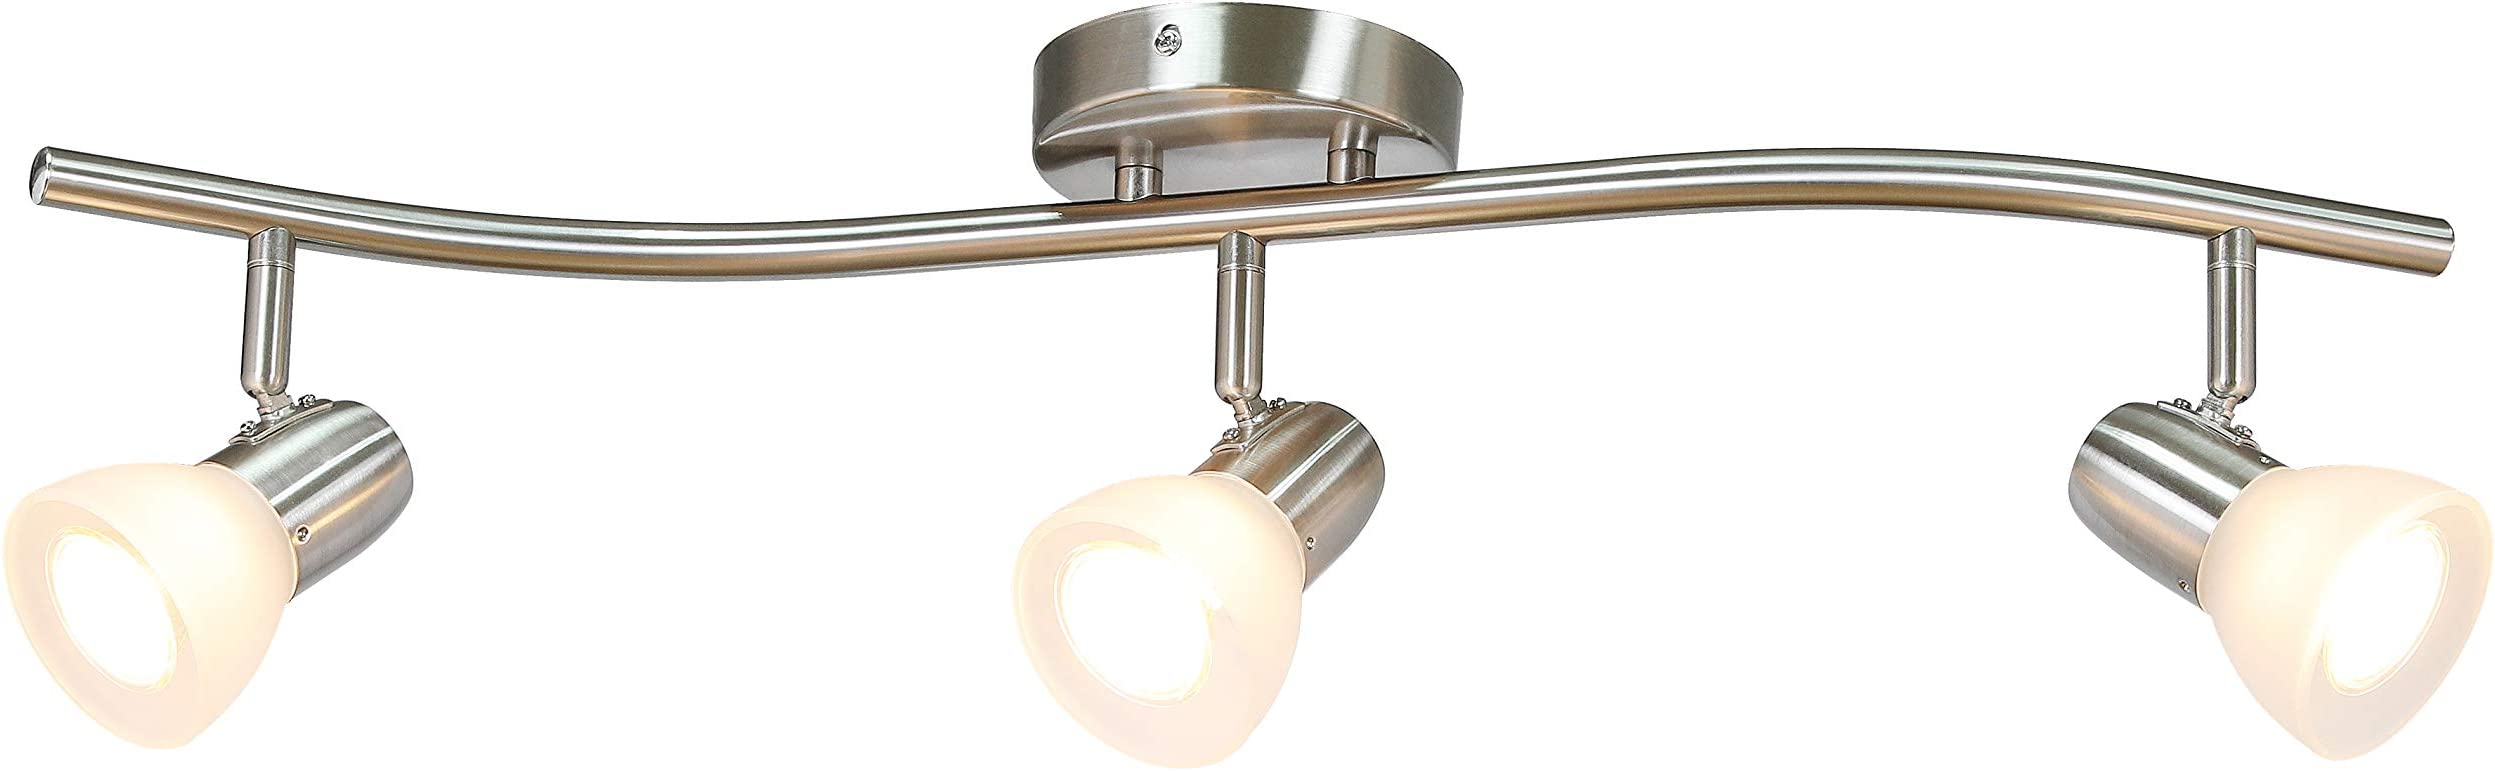 XiNBEi Lighting Track Lighting, 3 Light Track Light, Modern S-Shaped Track Light Bar Included GU10 Bulb Brushed Nickel Finish XB-TR1223-3